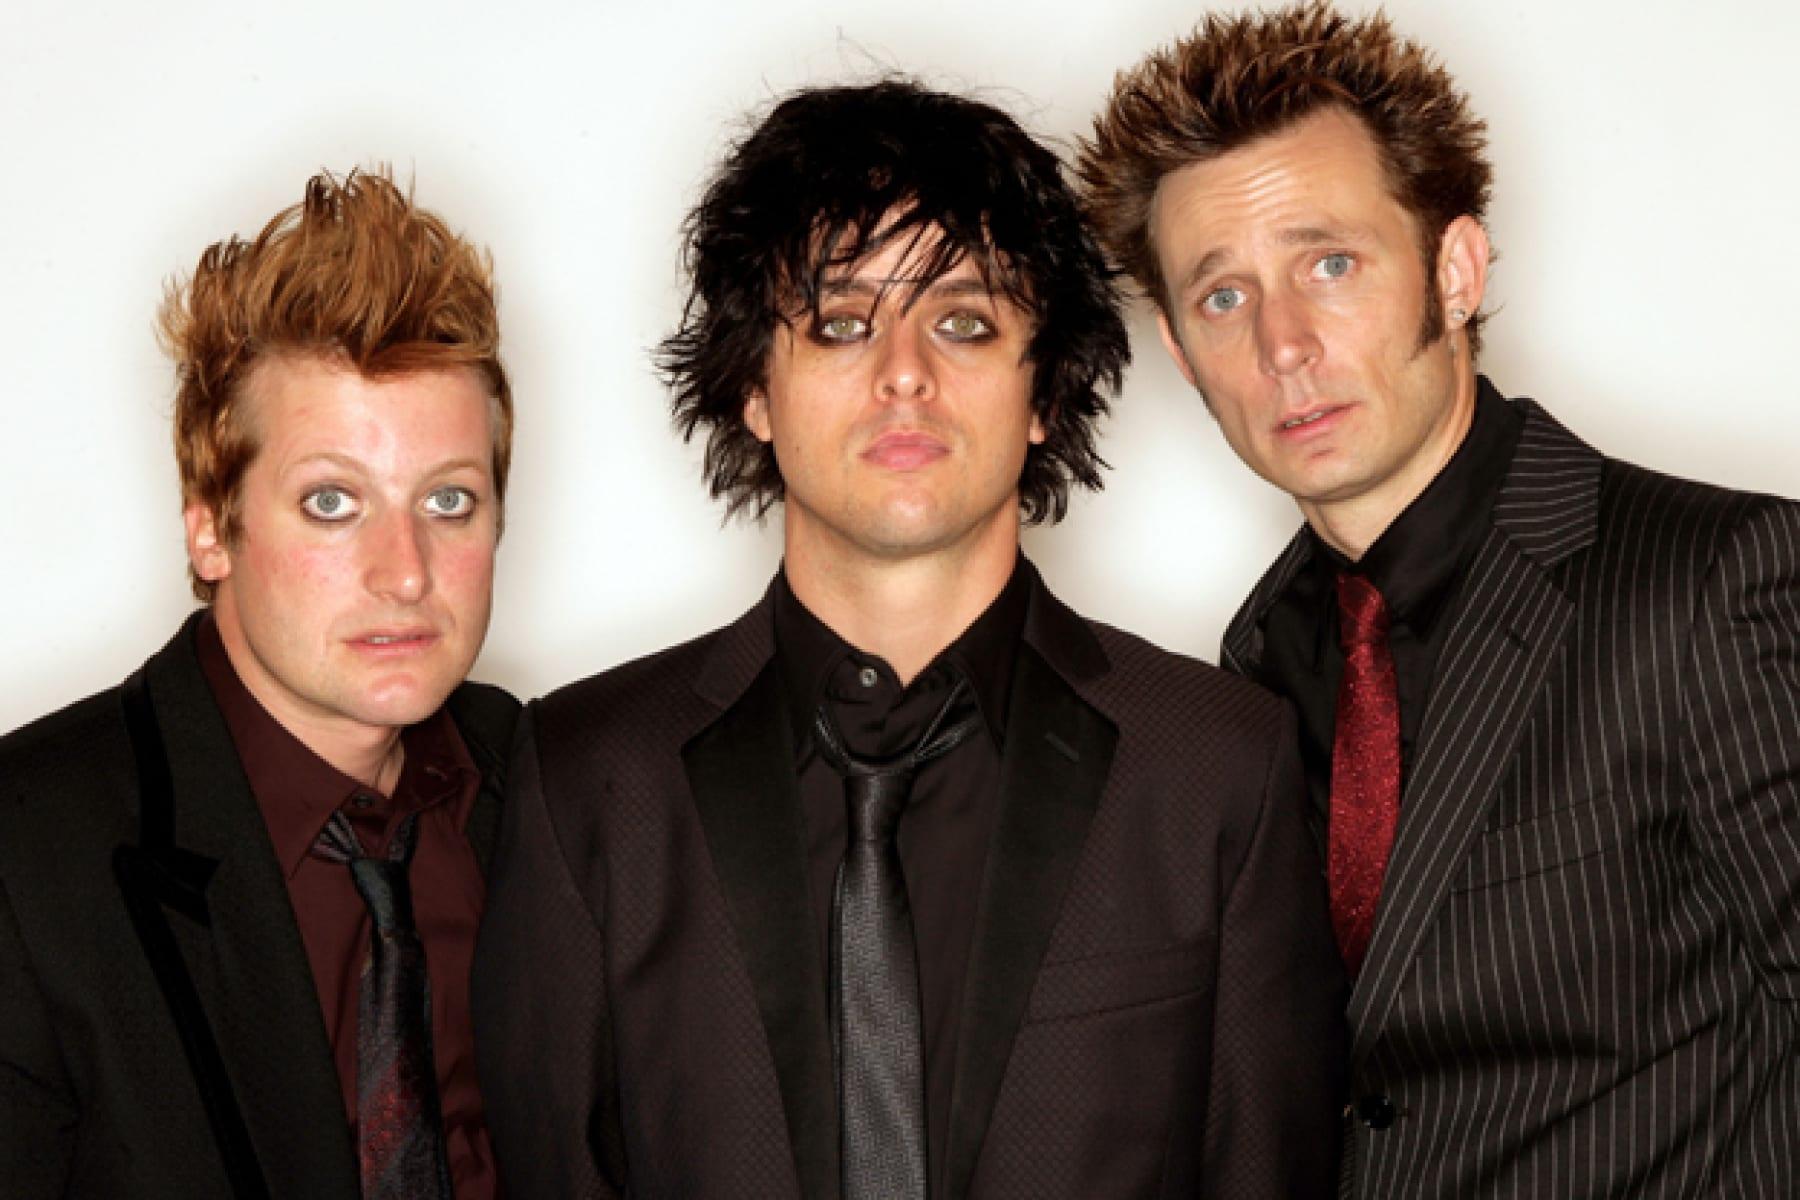 Has Green Day broken up?